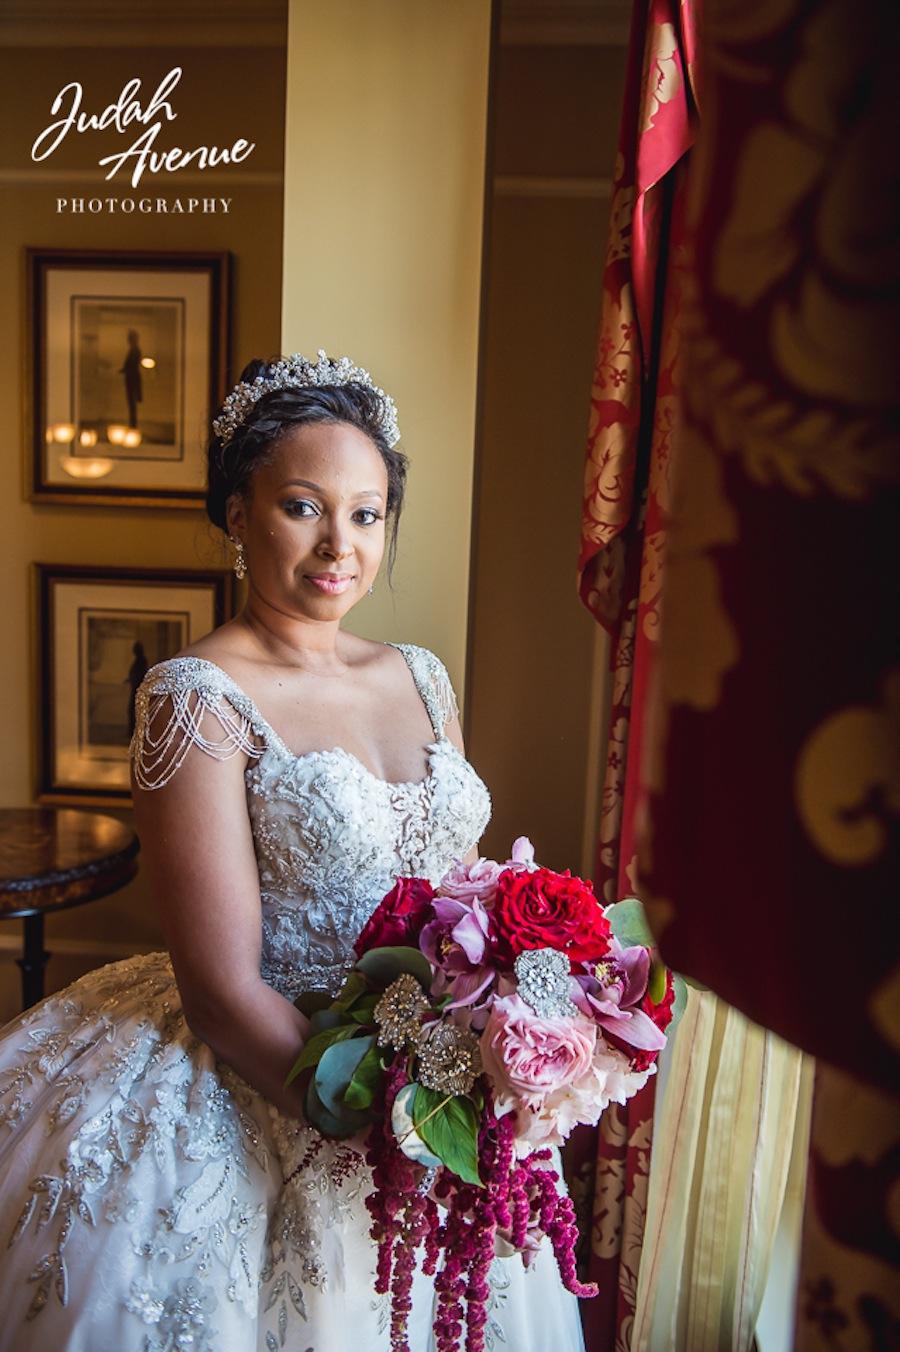 Krystle-Deonte-wedding-at-Willard-Intercontinental-wedding-photography-in-washington-dc-maryland-virginia-201.jpg